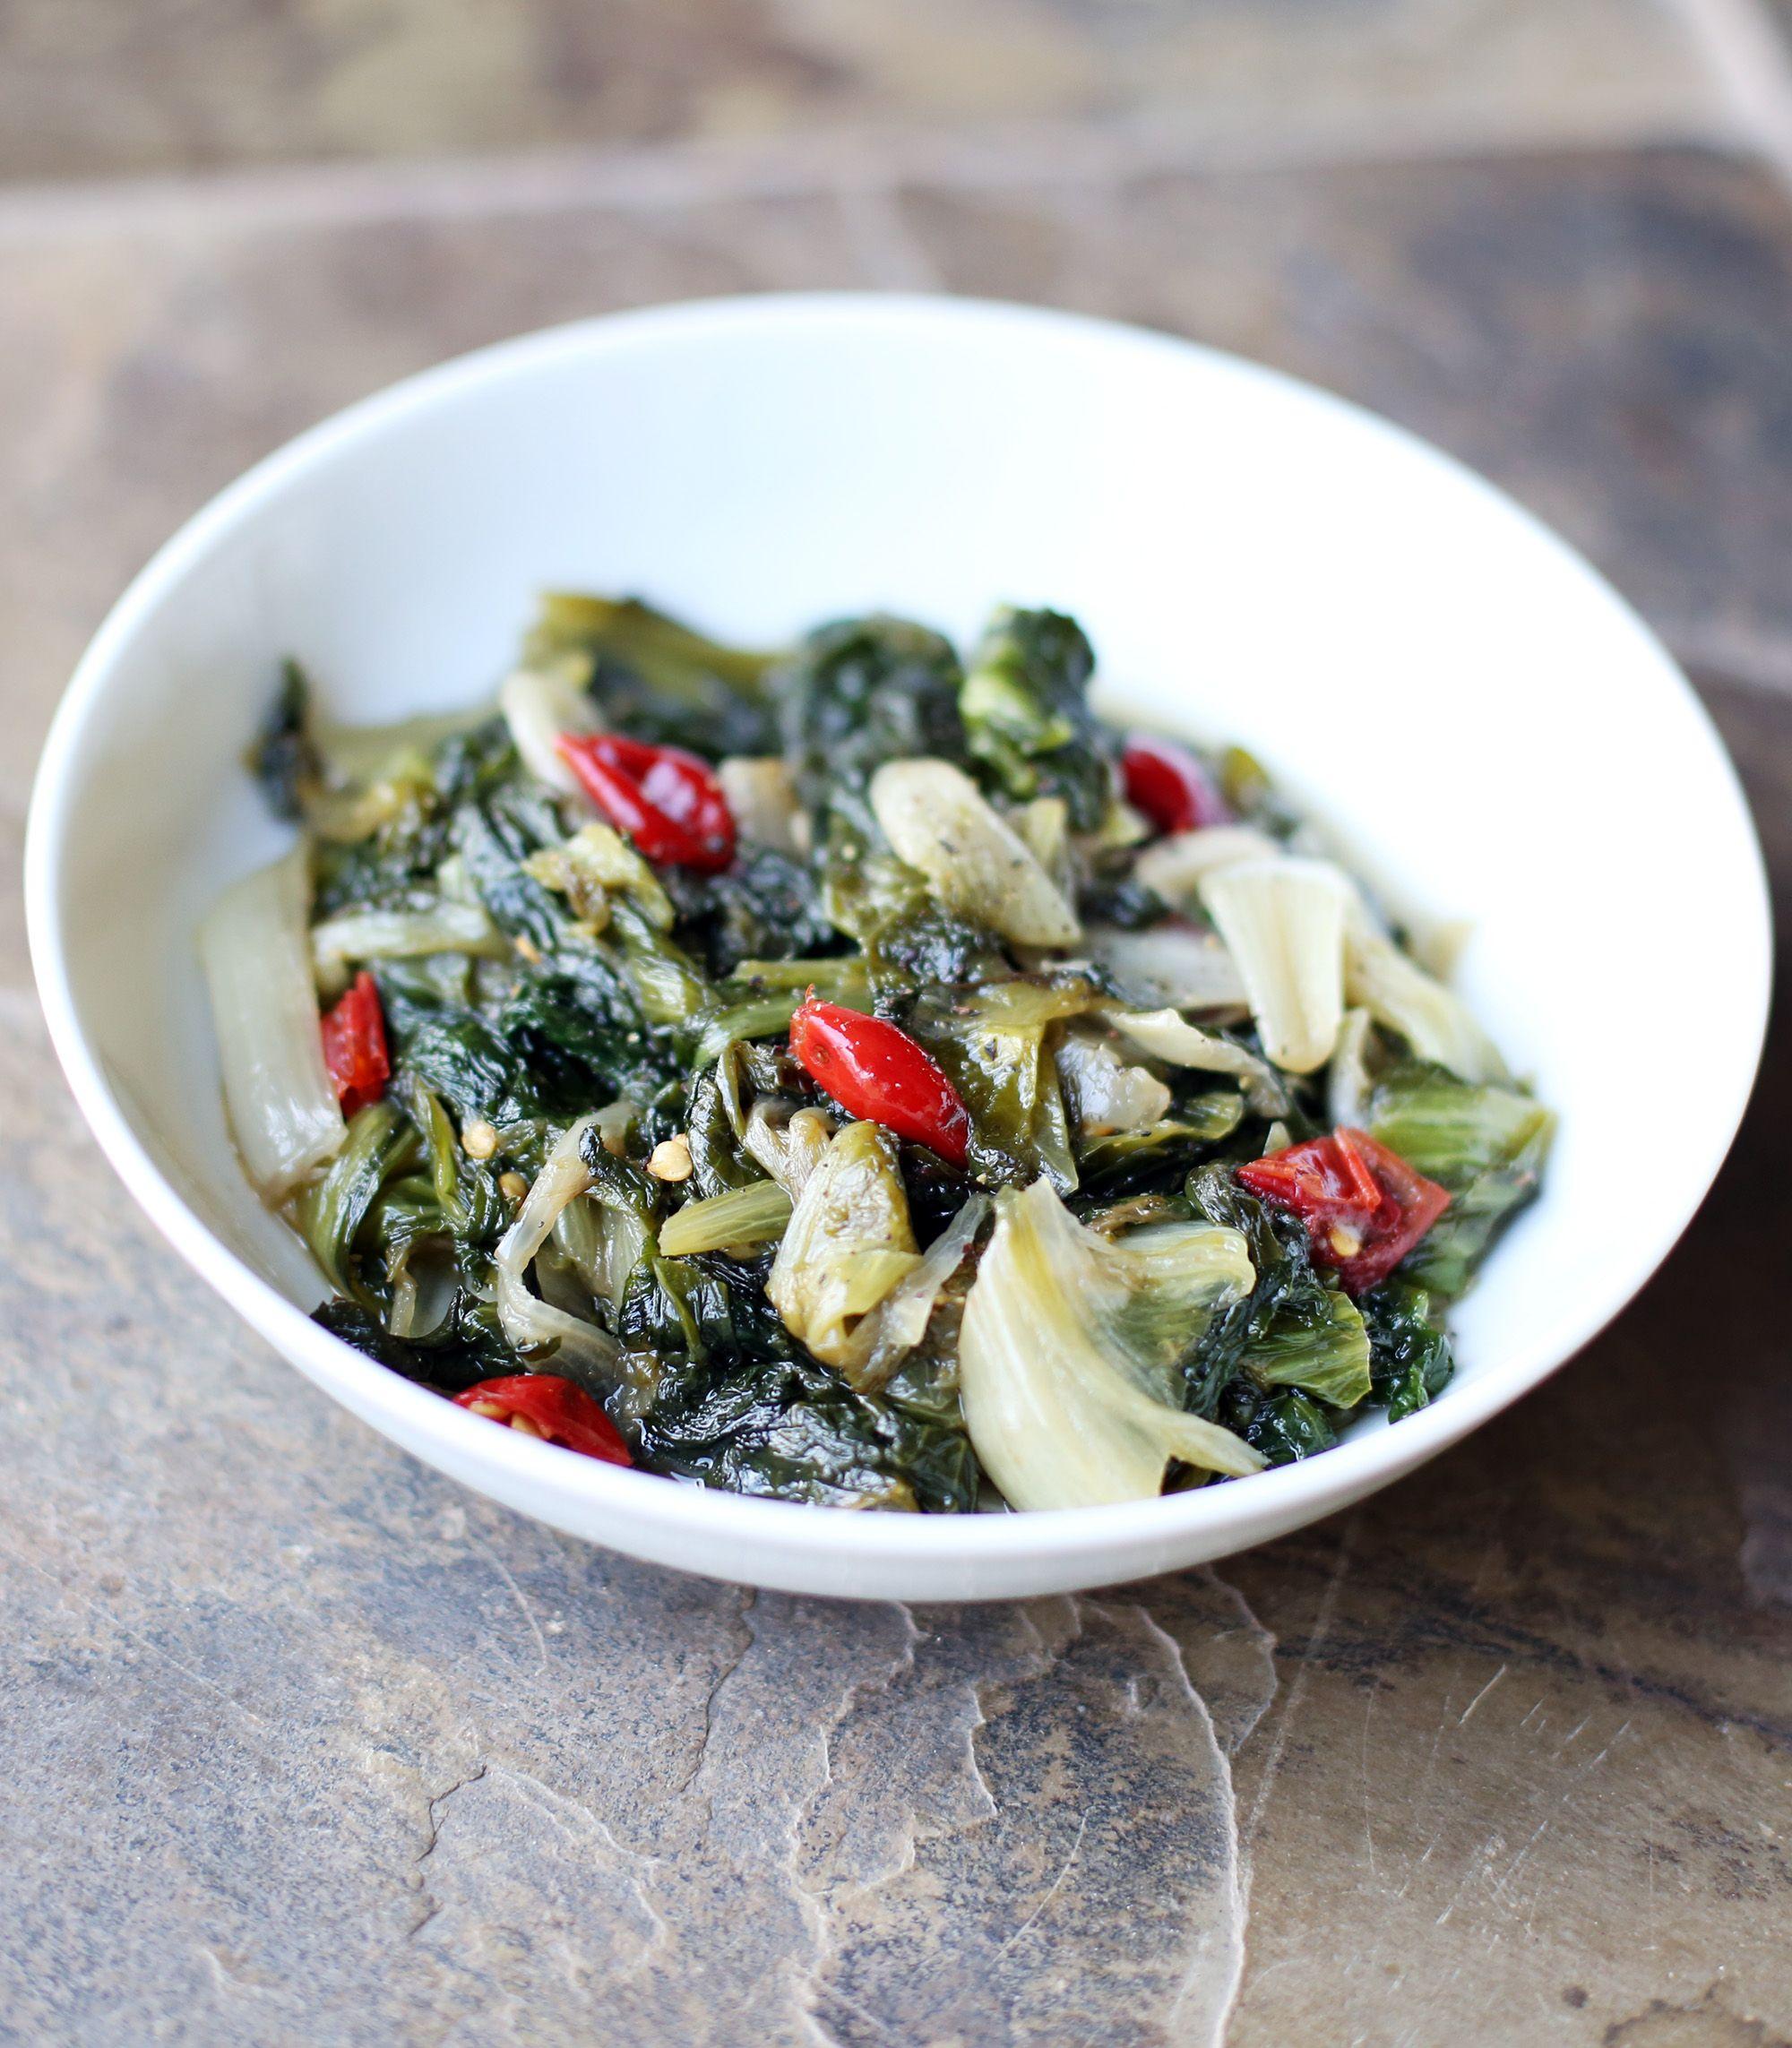 Braised Escarole With Anchovies, Garlic & Calabrian